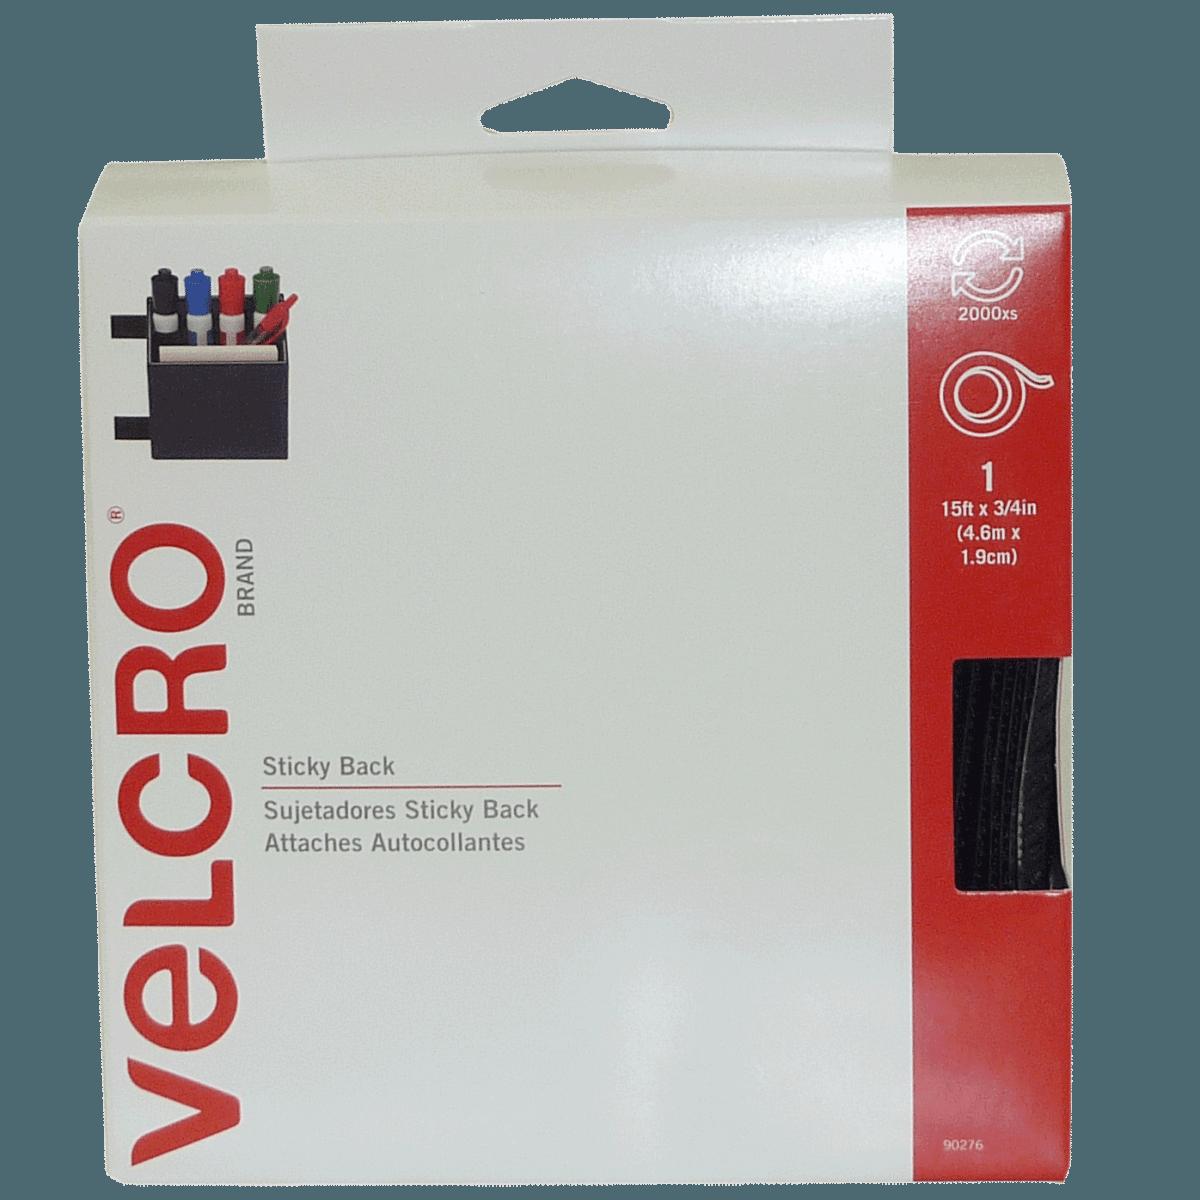 Attaches Autocollantes Velcro - 4.6m x 1.9cm